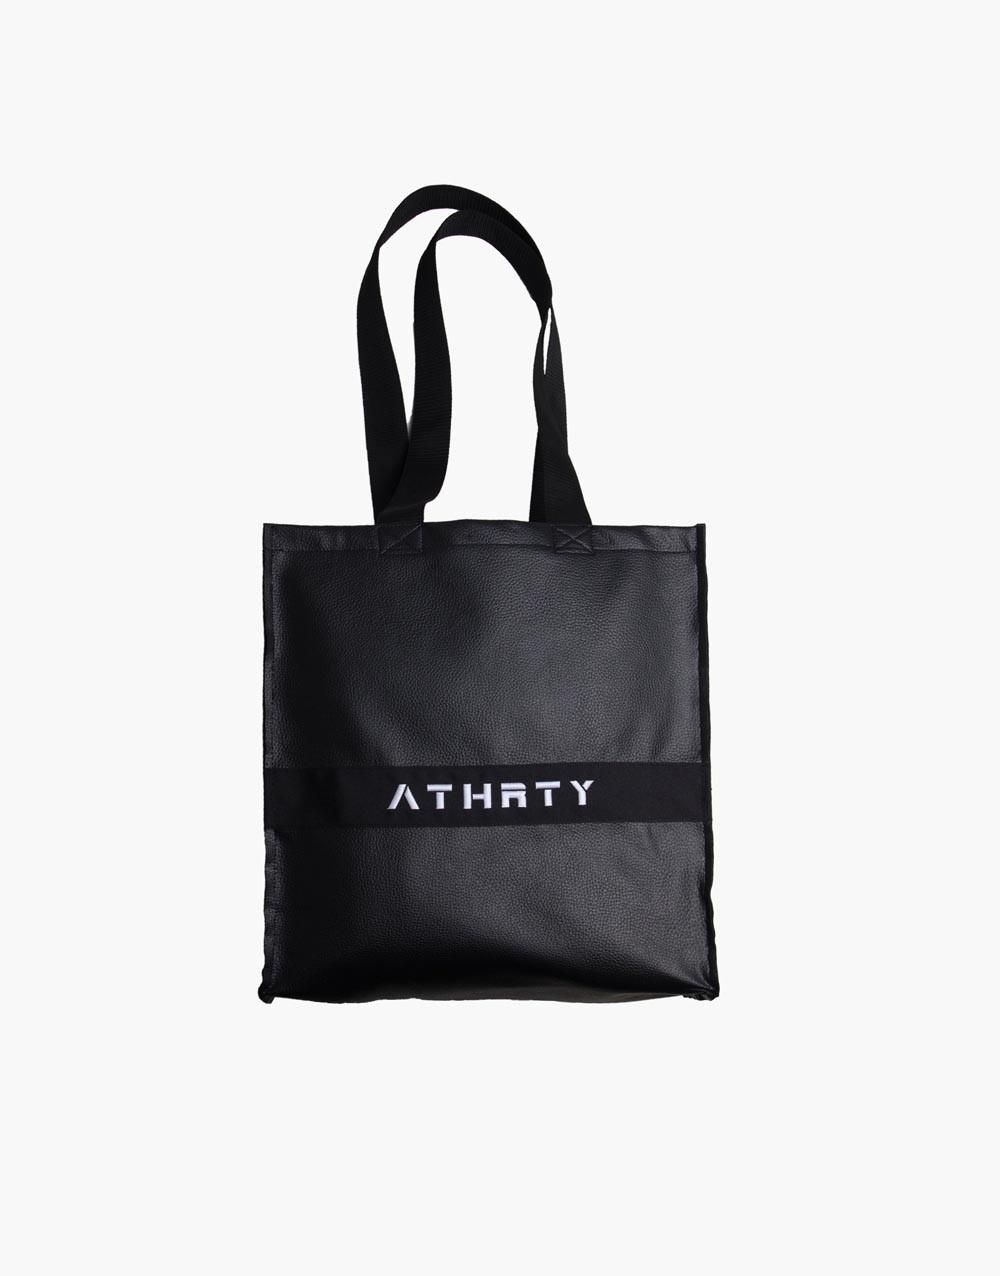 ATHRTY Tote Bag